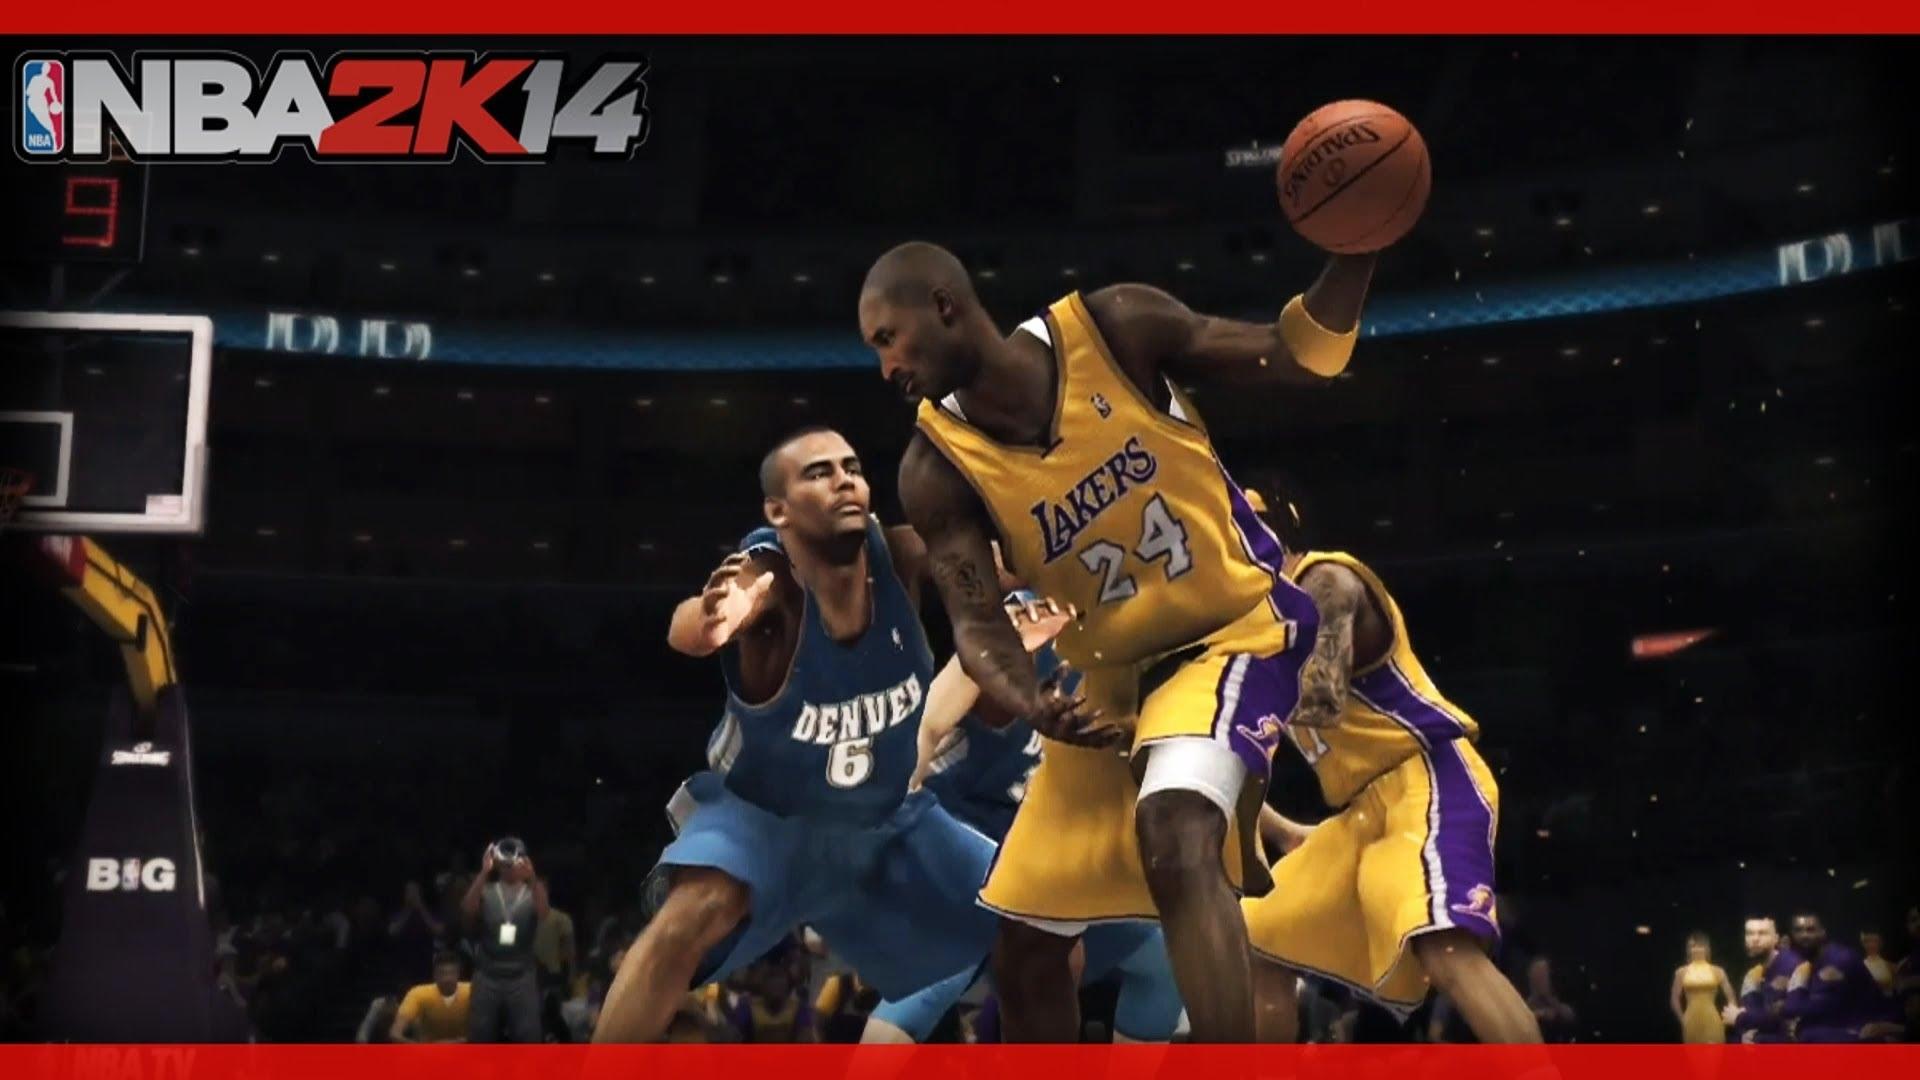 《NBA 2K14》壁纸1